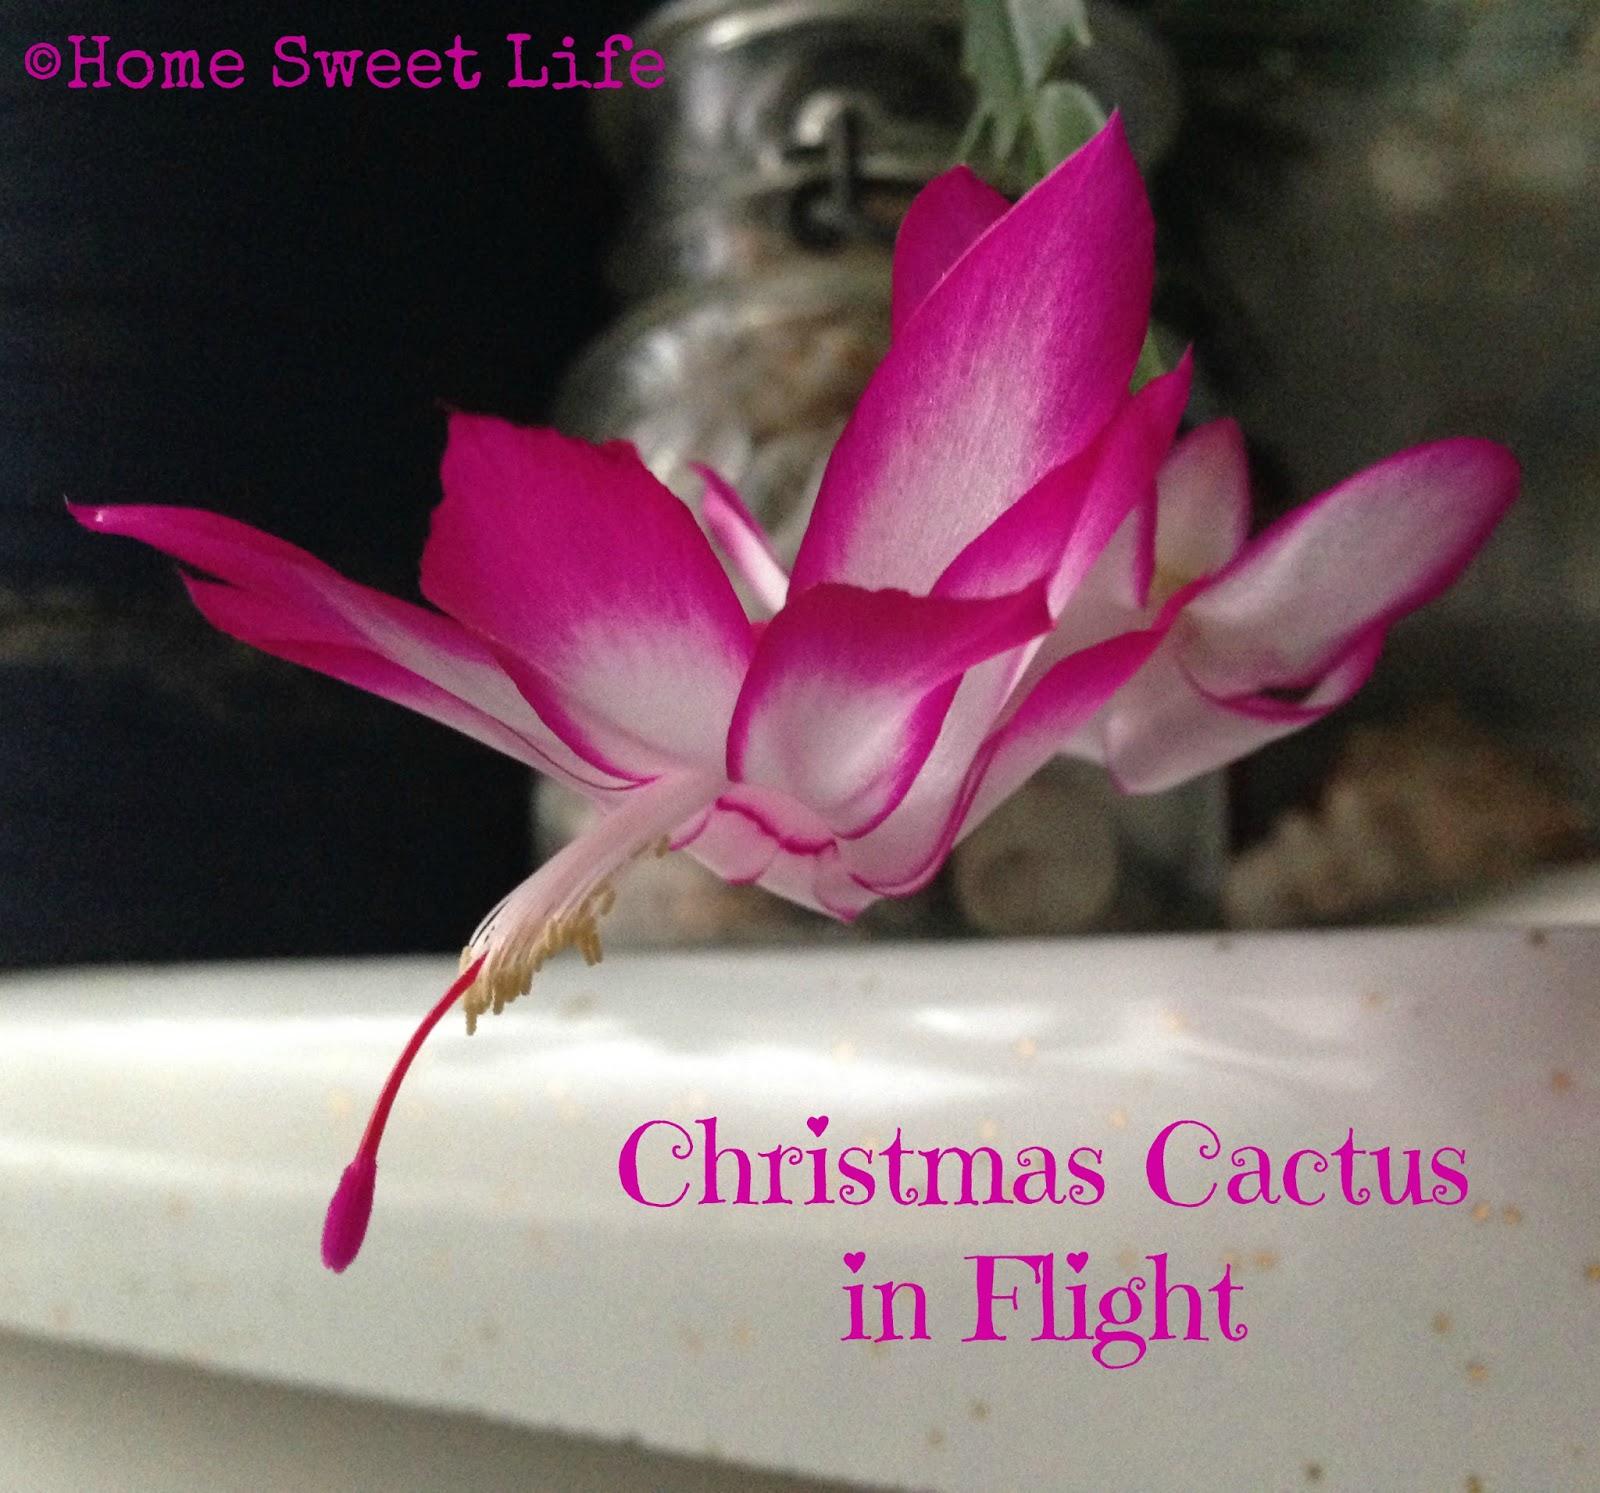 Christmas Cactus, thankfulness